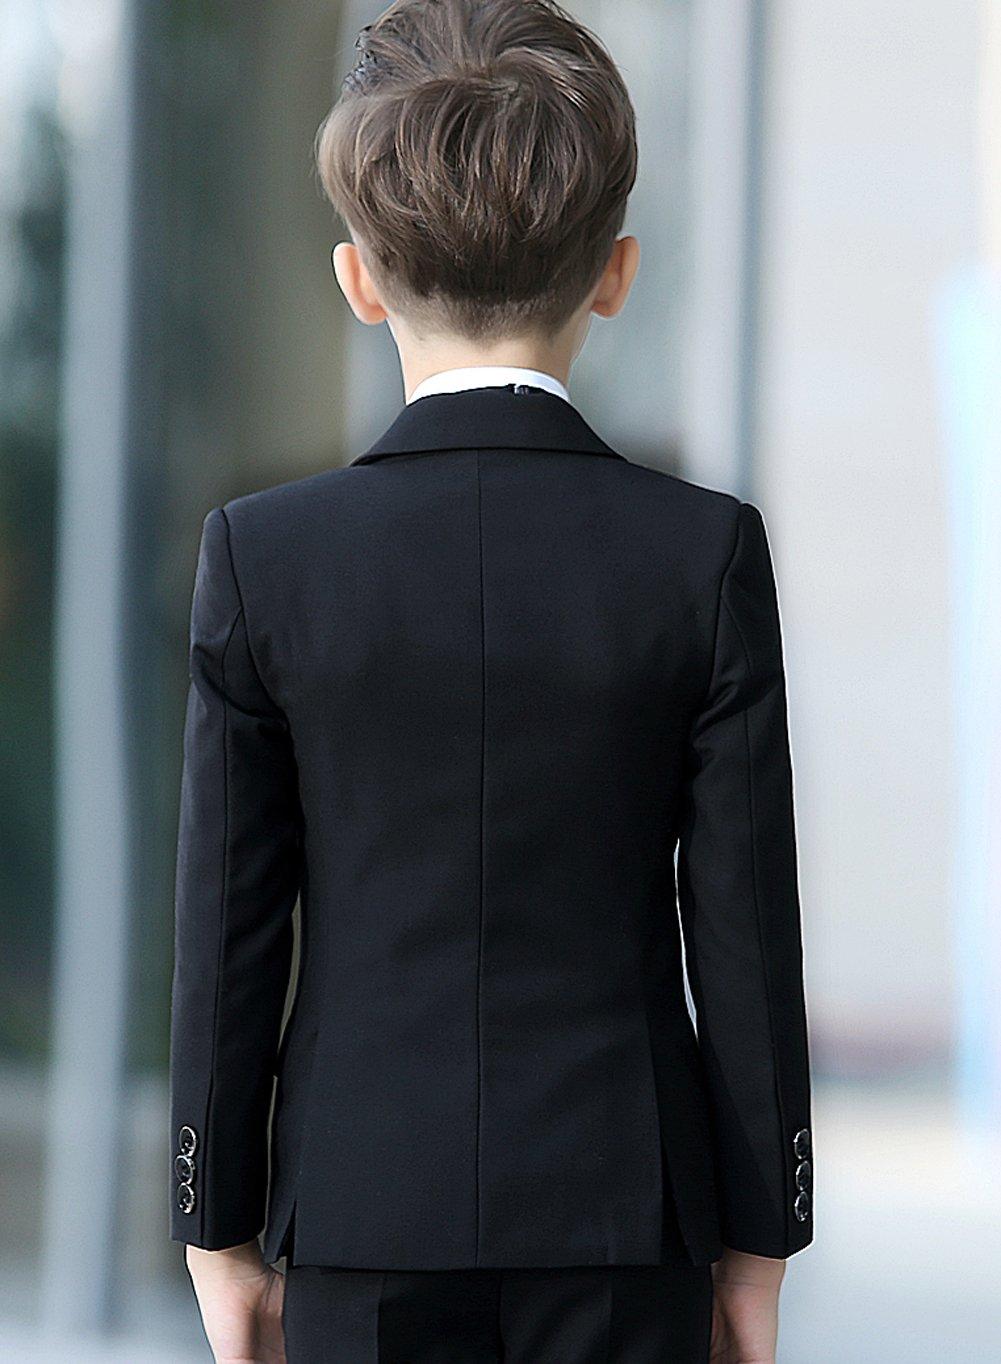 YuanLu Boys Colorful Formal Suits 5 Piece Slim Fit Dresswear Suit Set (Black, 14) by YuanLu (Image #4)